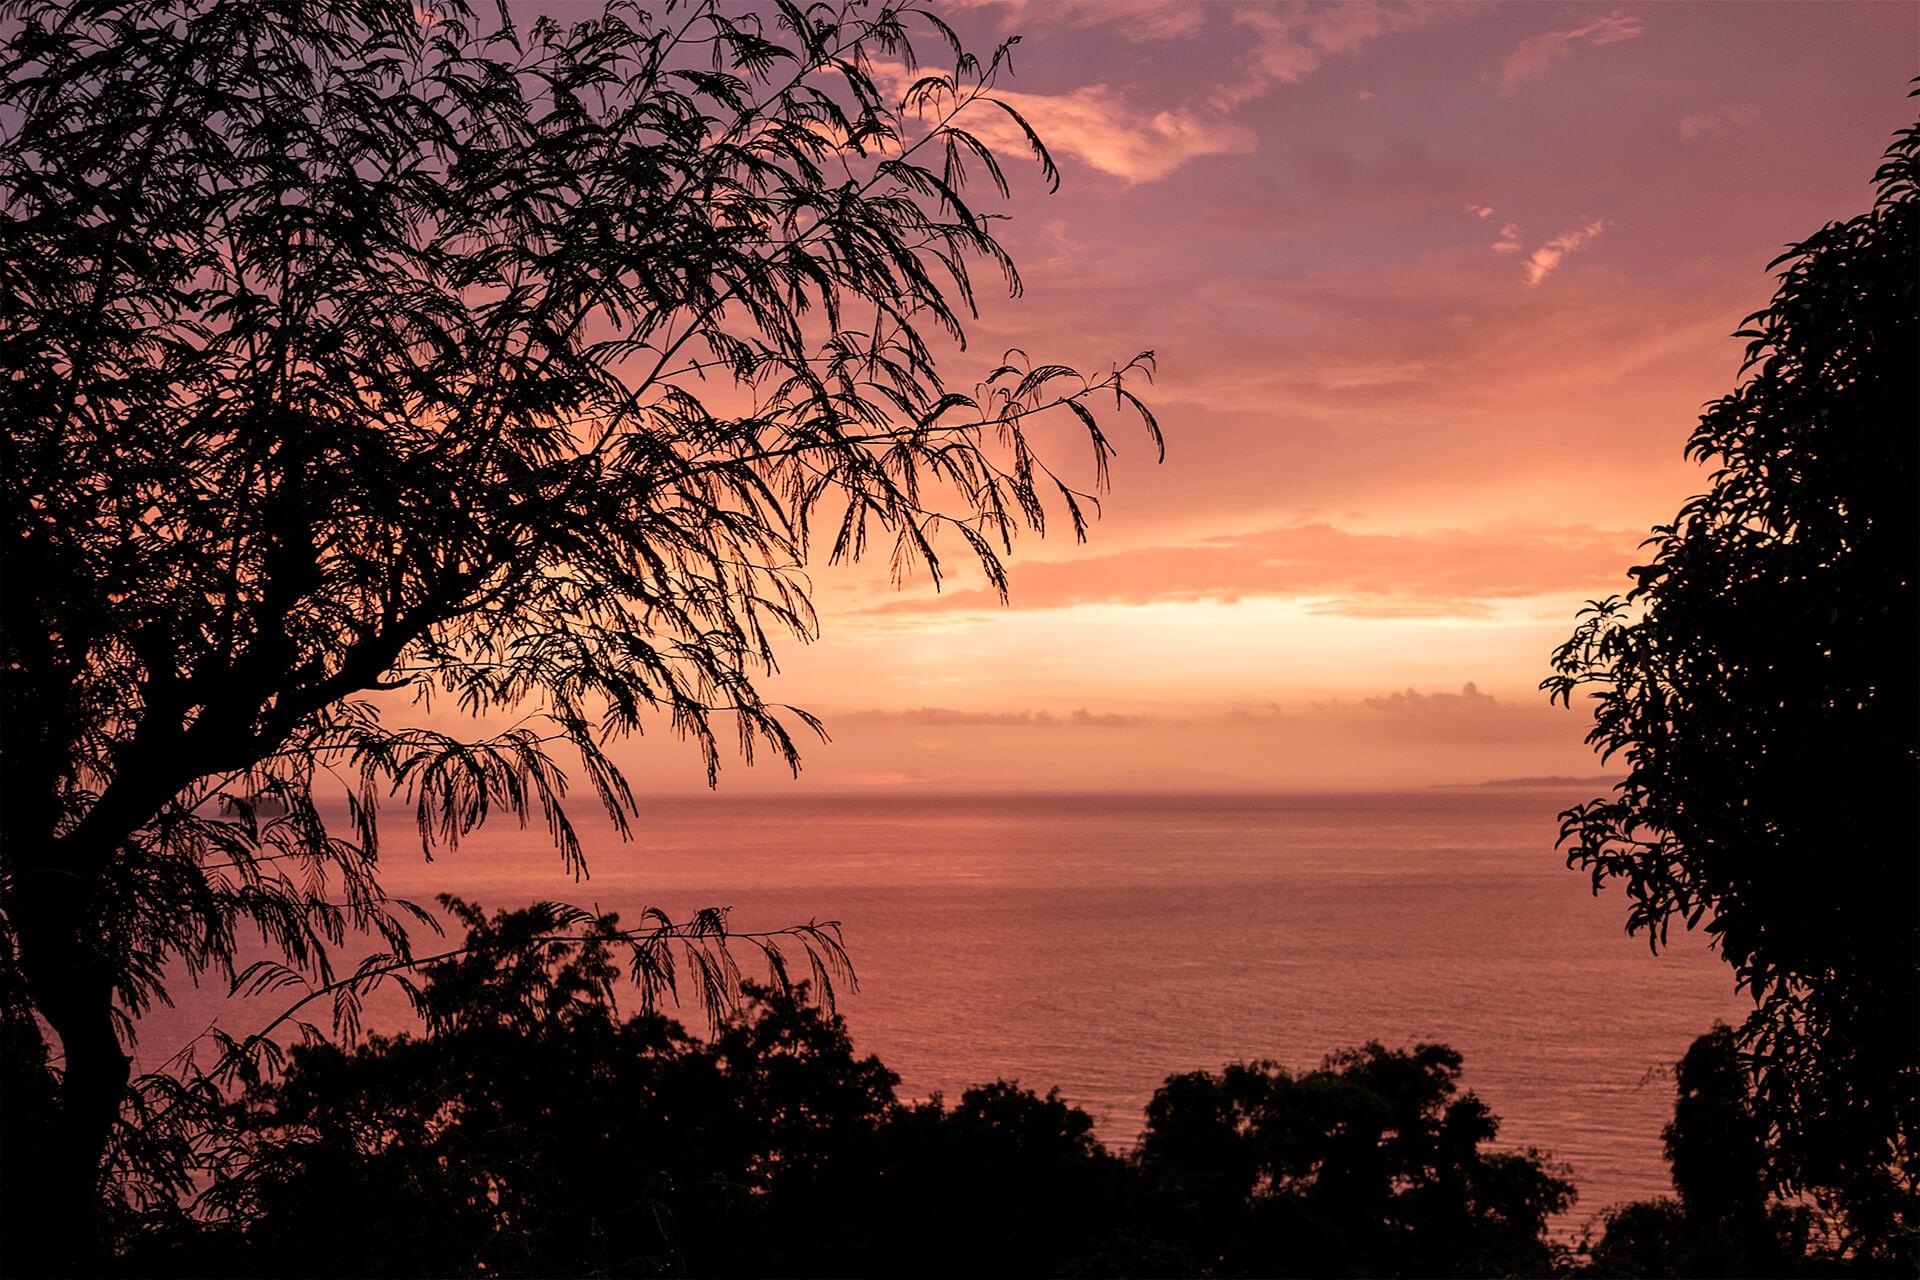 A sunset in Anilao